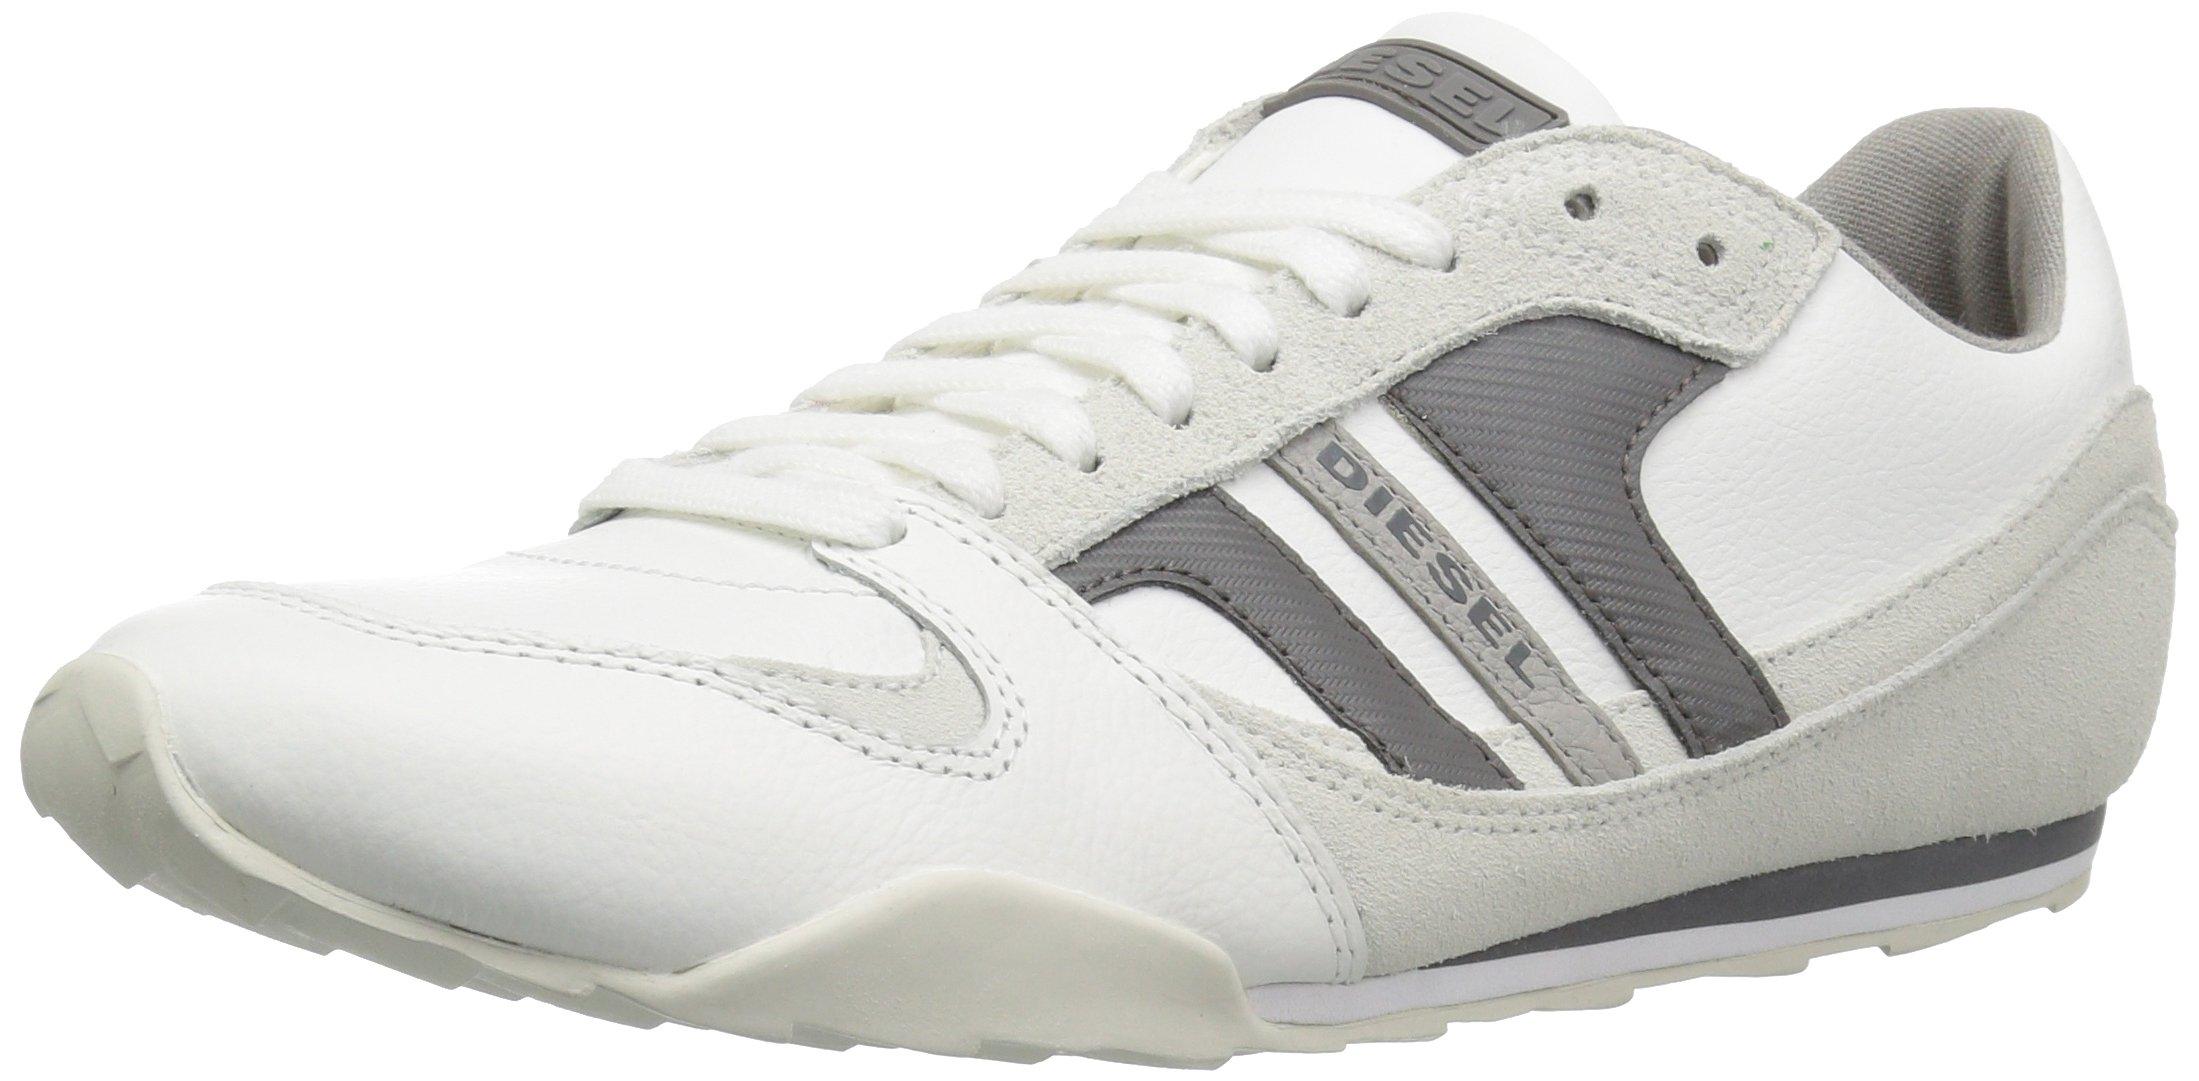 Diesel Men's Gunner Fashion Sneaker,White/Charcoal Grey,9.5 M US